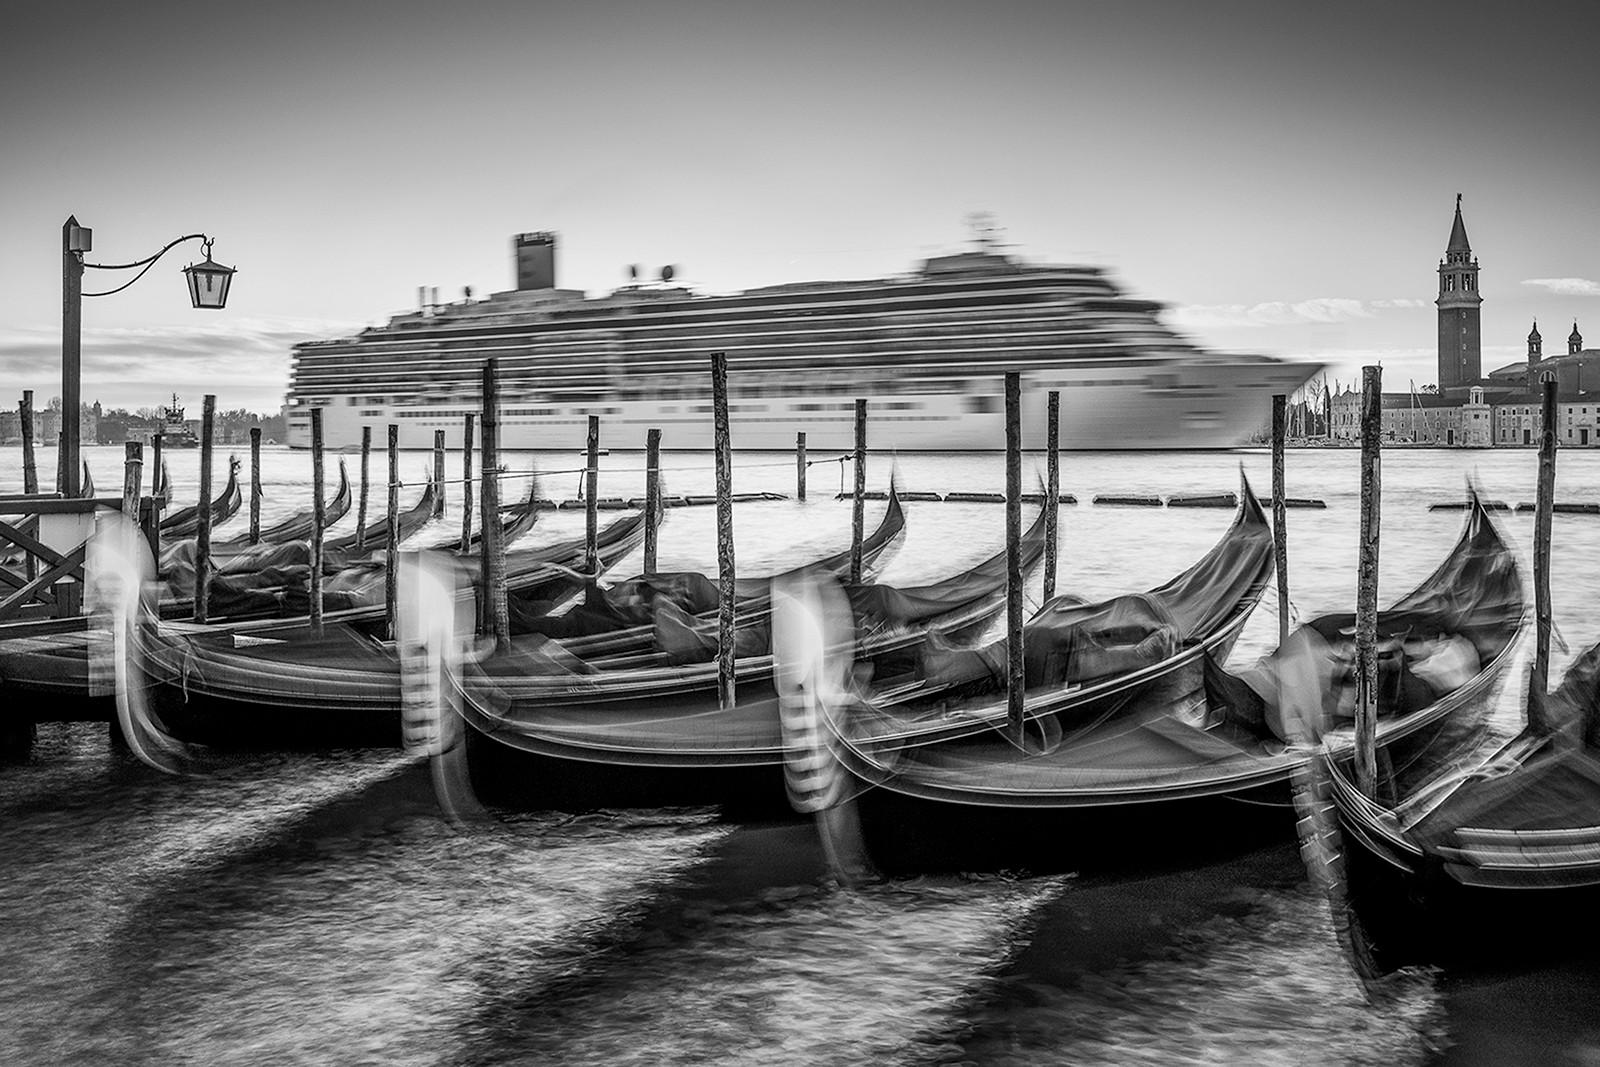 MONO - Sail Away by Roy Crawford (11 marks)